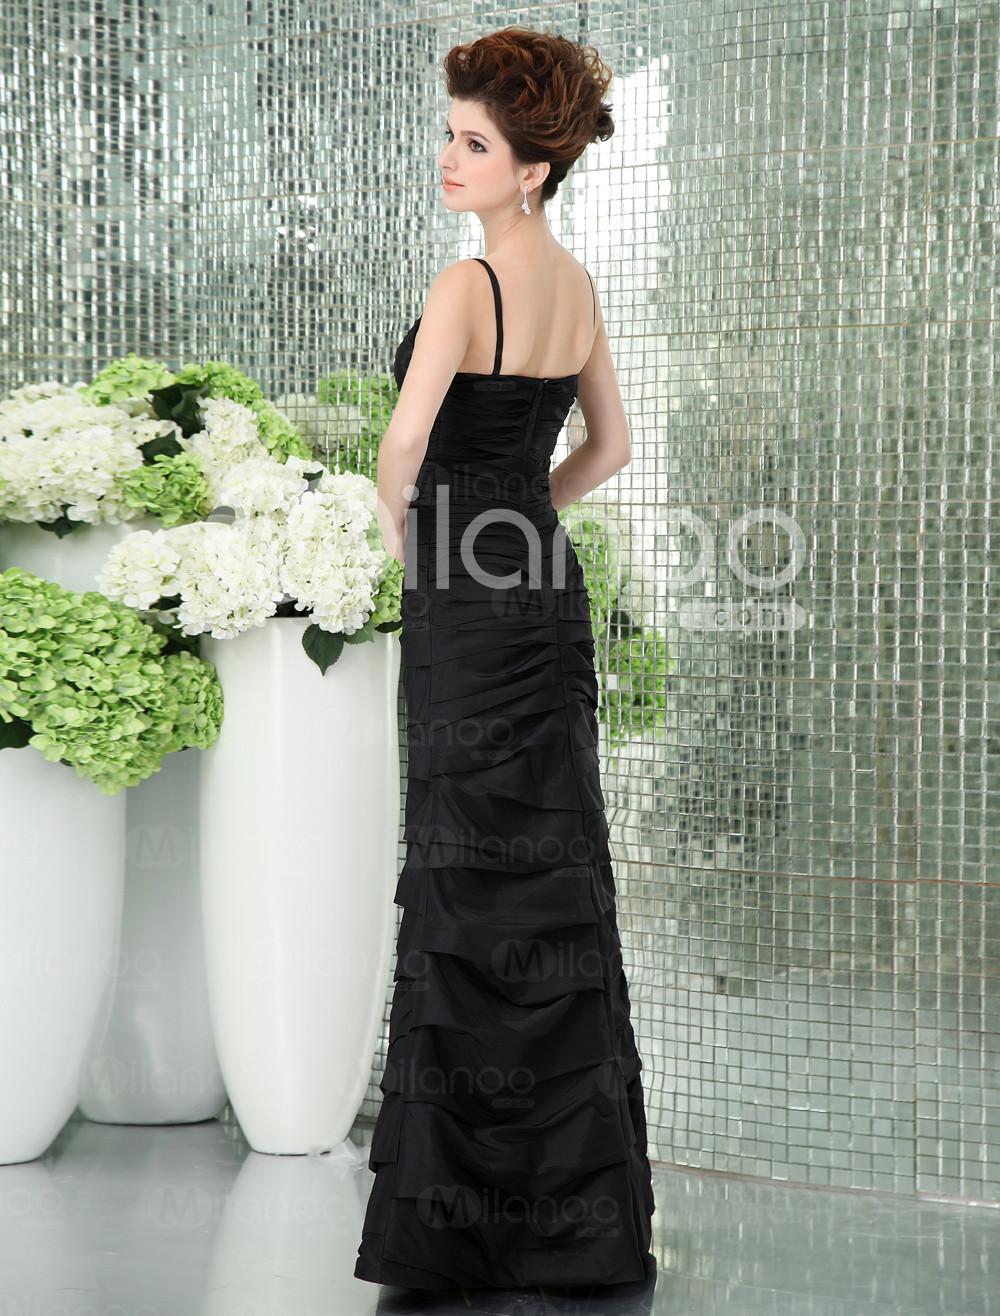 Slim Black étage taffetas Longueur sirène trompette robe de bal